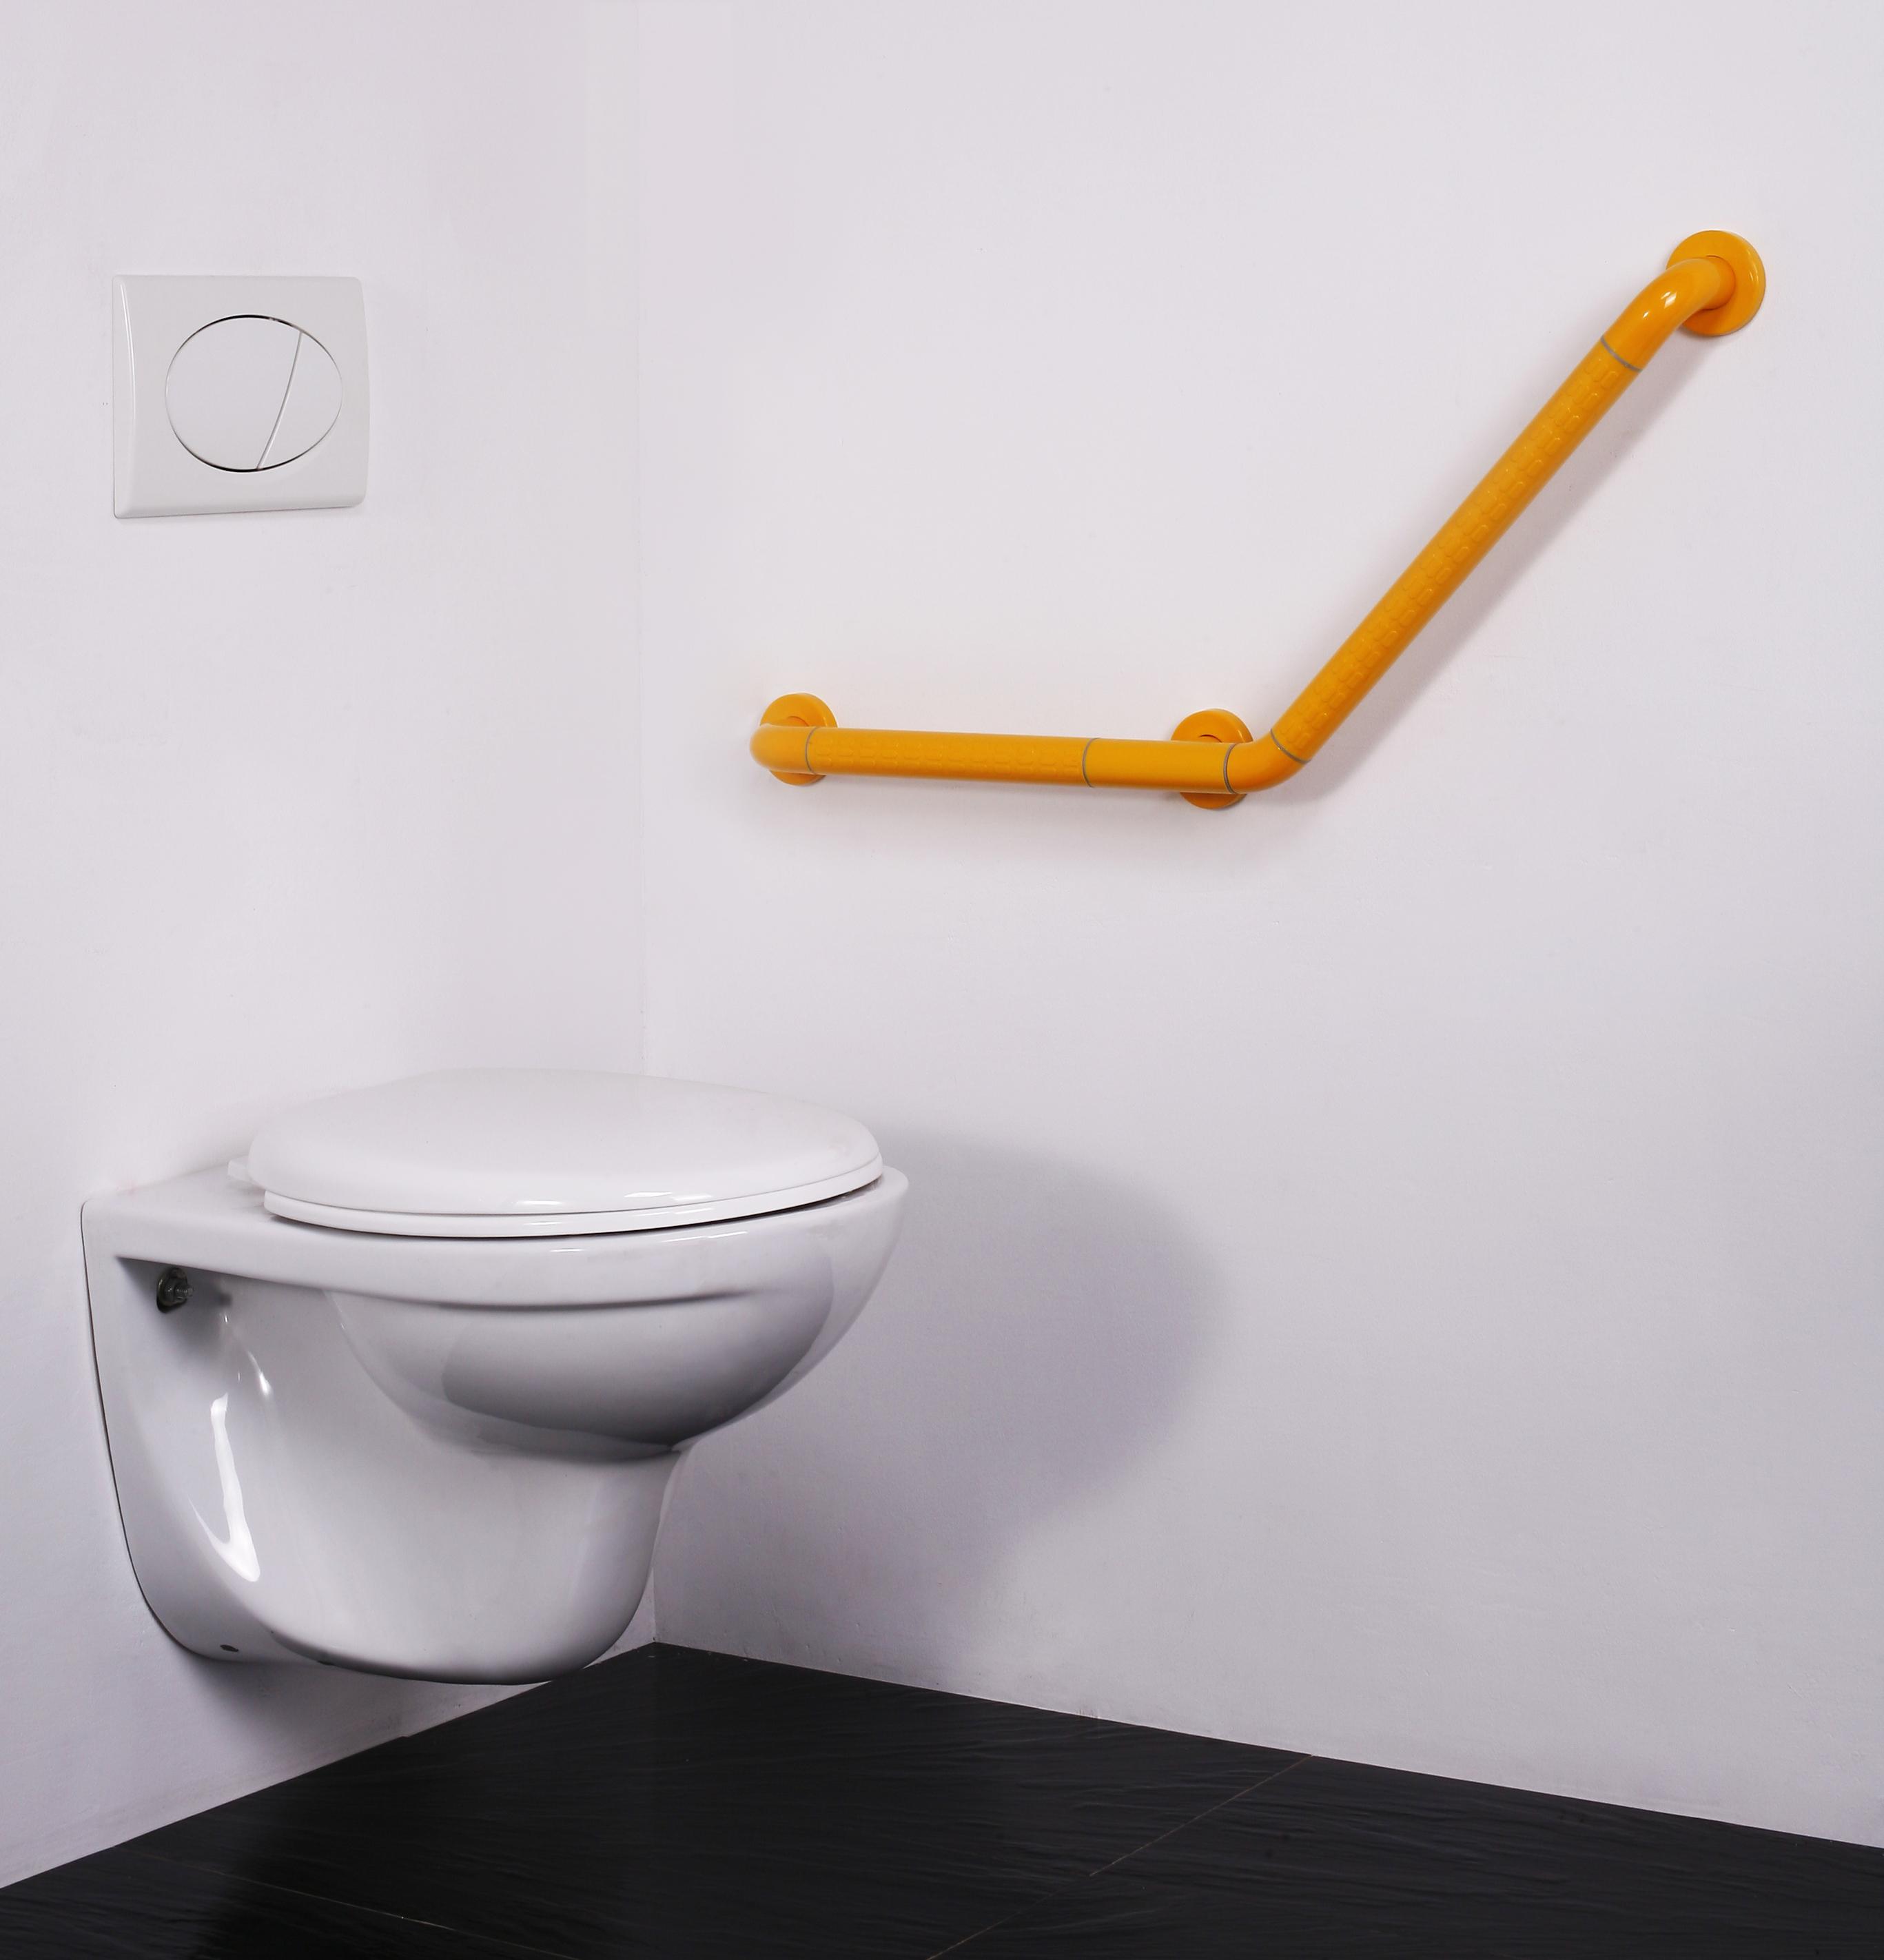 Bathroom Aids | Rehab Products - Goldfern Mobility